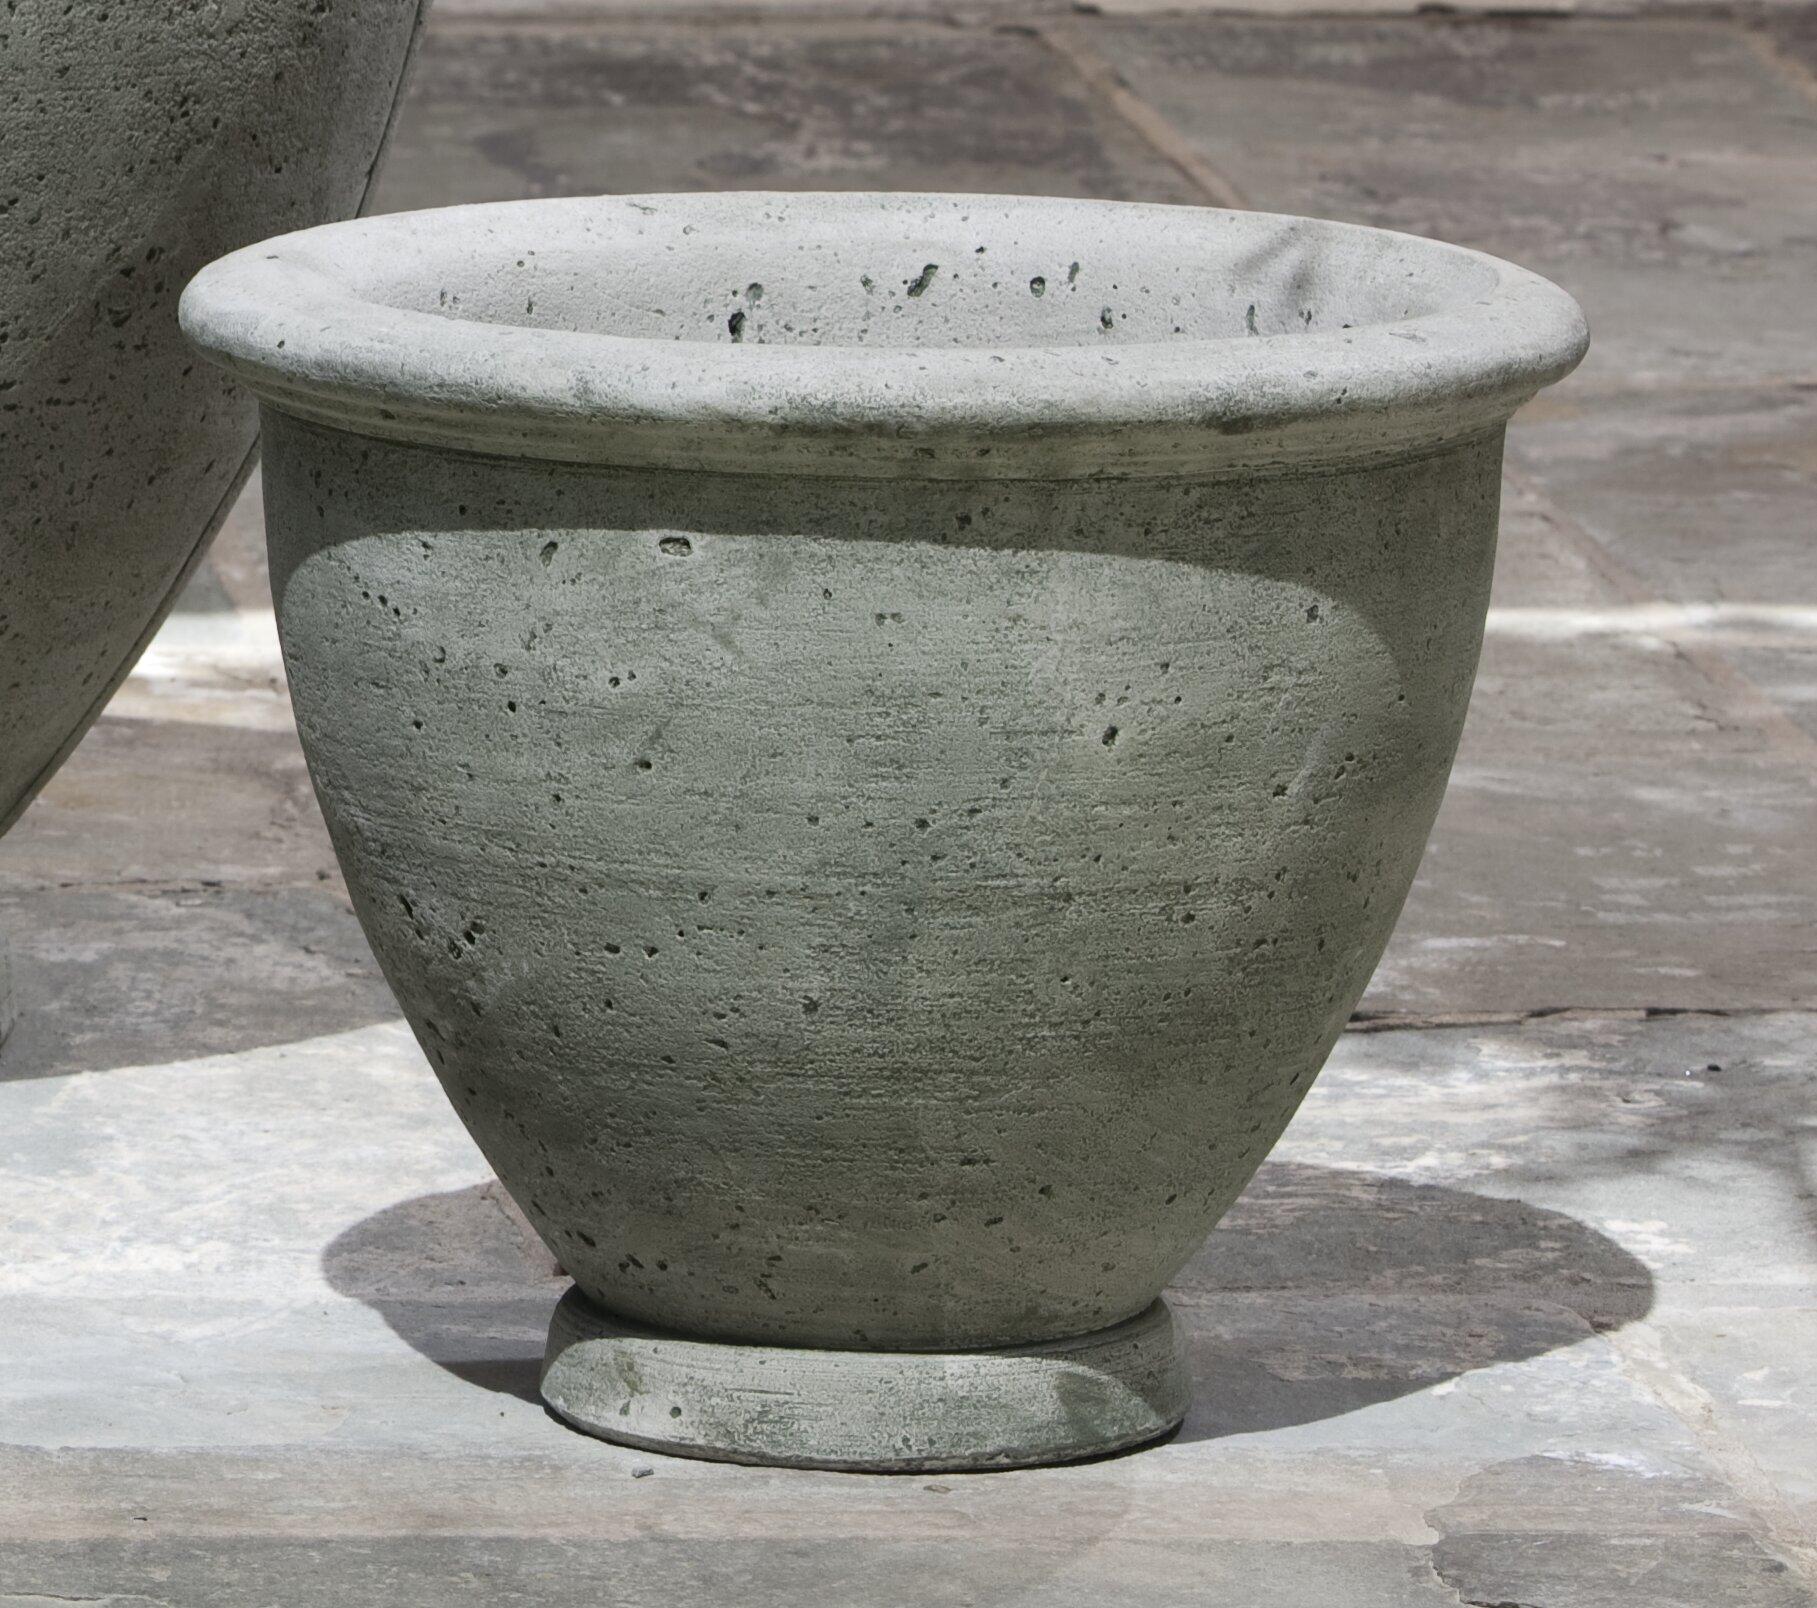 Concrete Planters - Up to 40% Off Through 9/29 | Wayfair